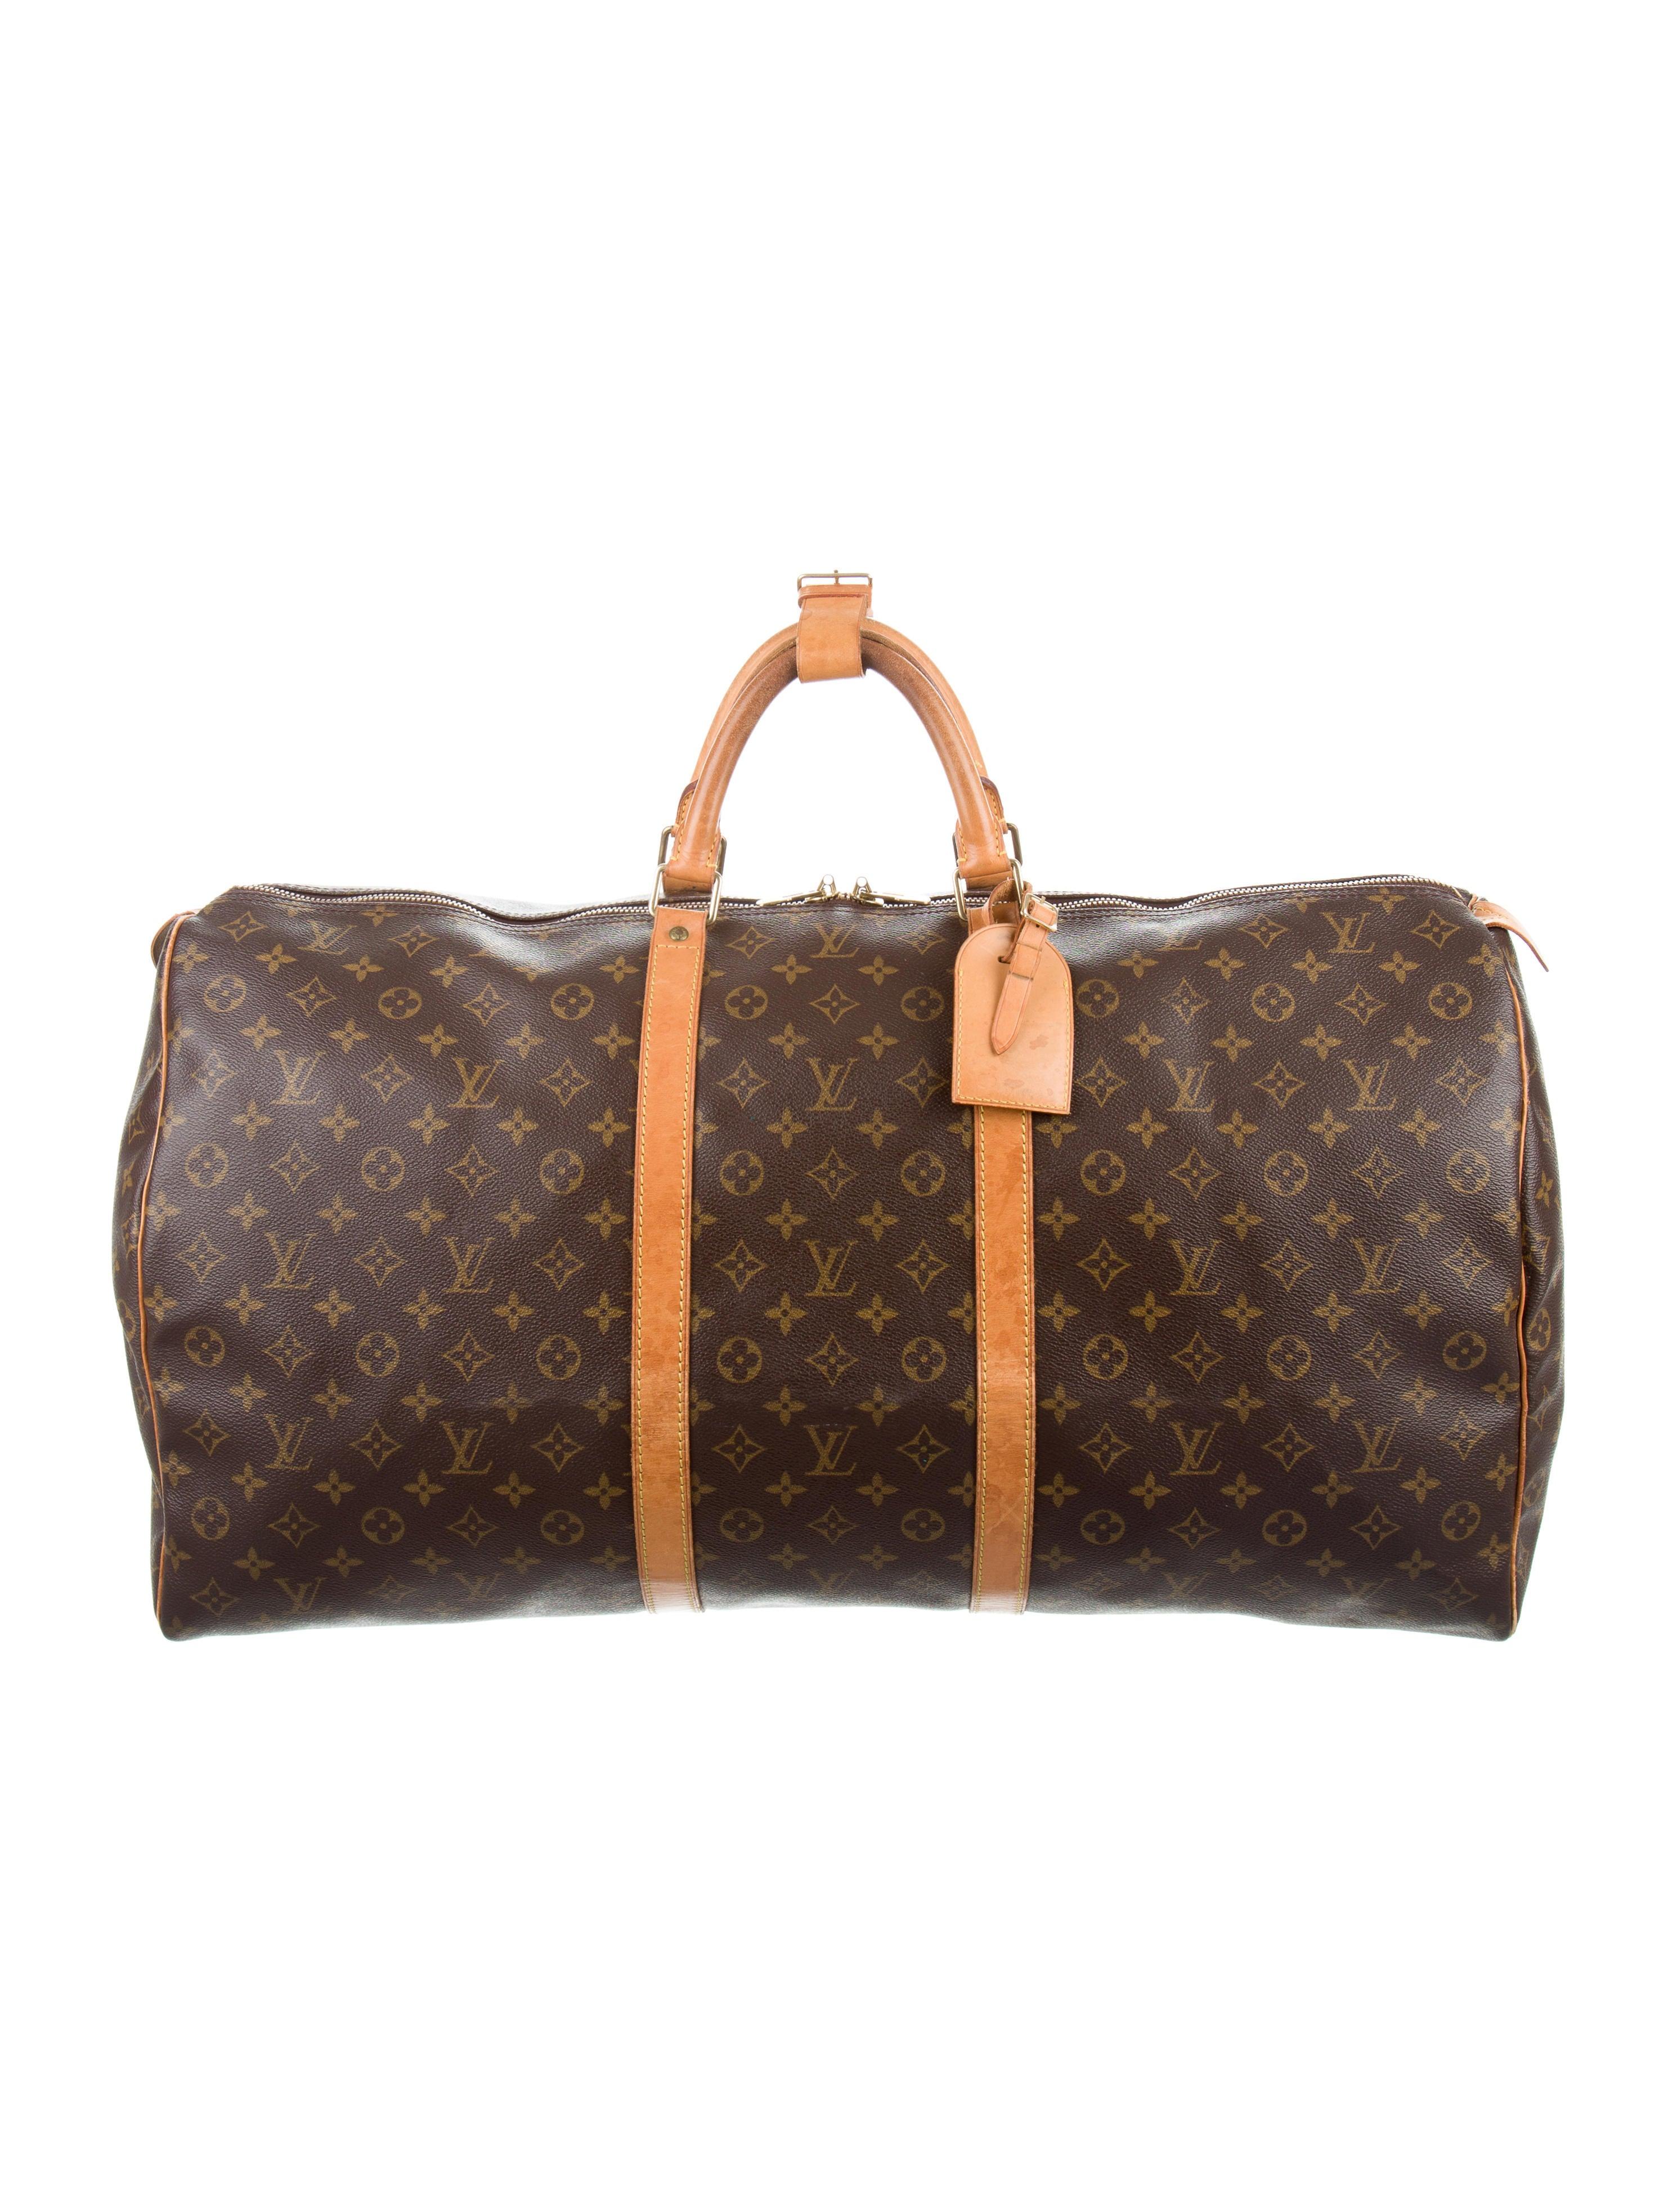 louis vuitton monogram keepall 60 handbags lou134613. Black Bedroom Furniture Sets. Home Design Ideas